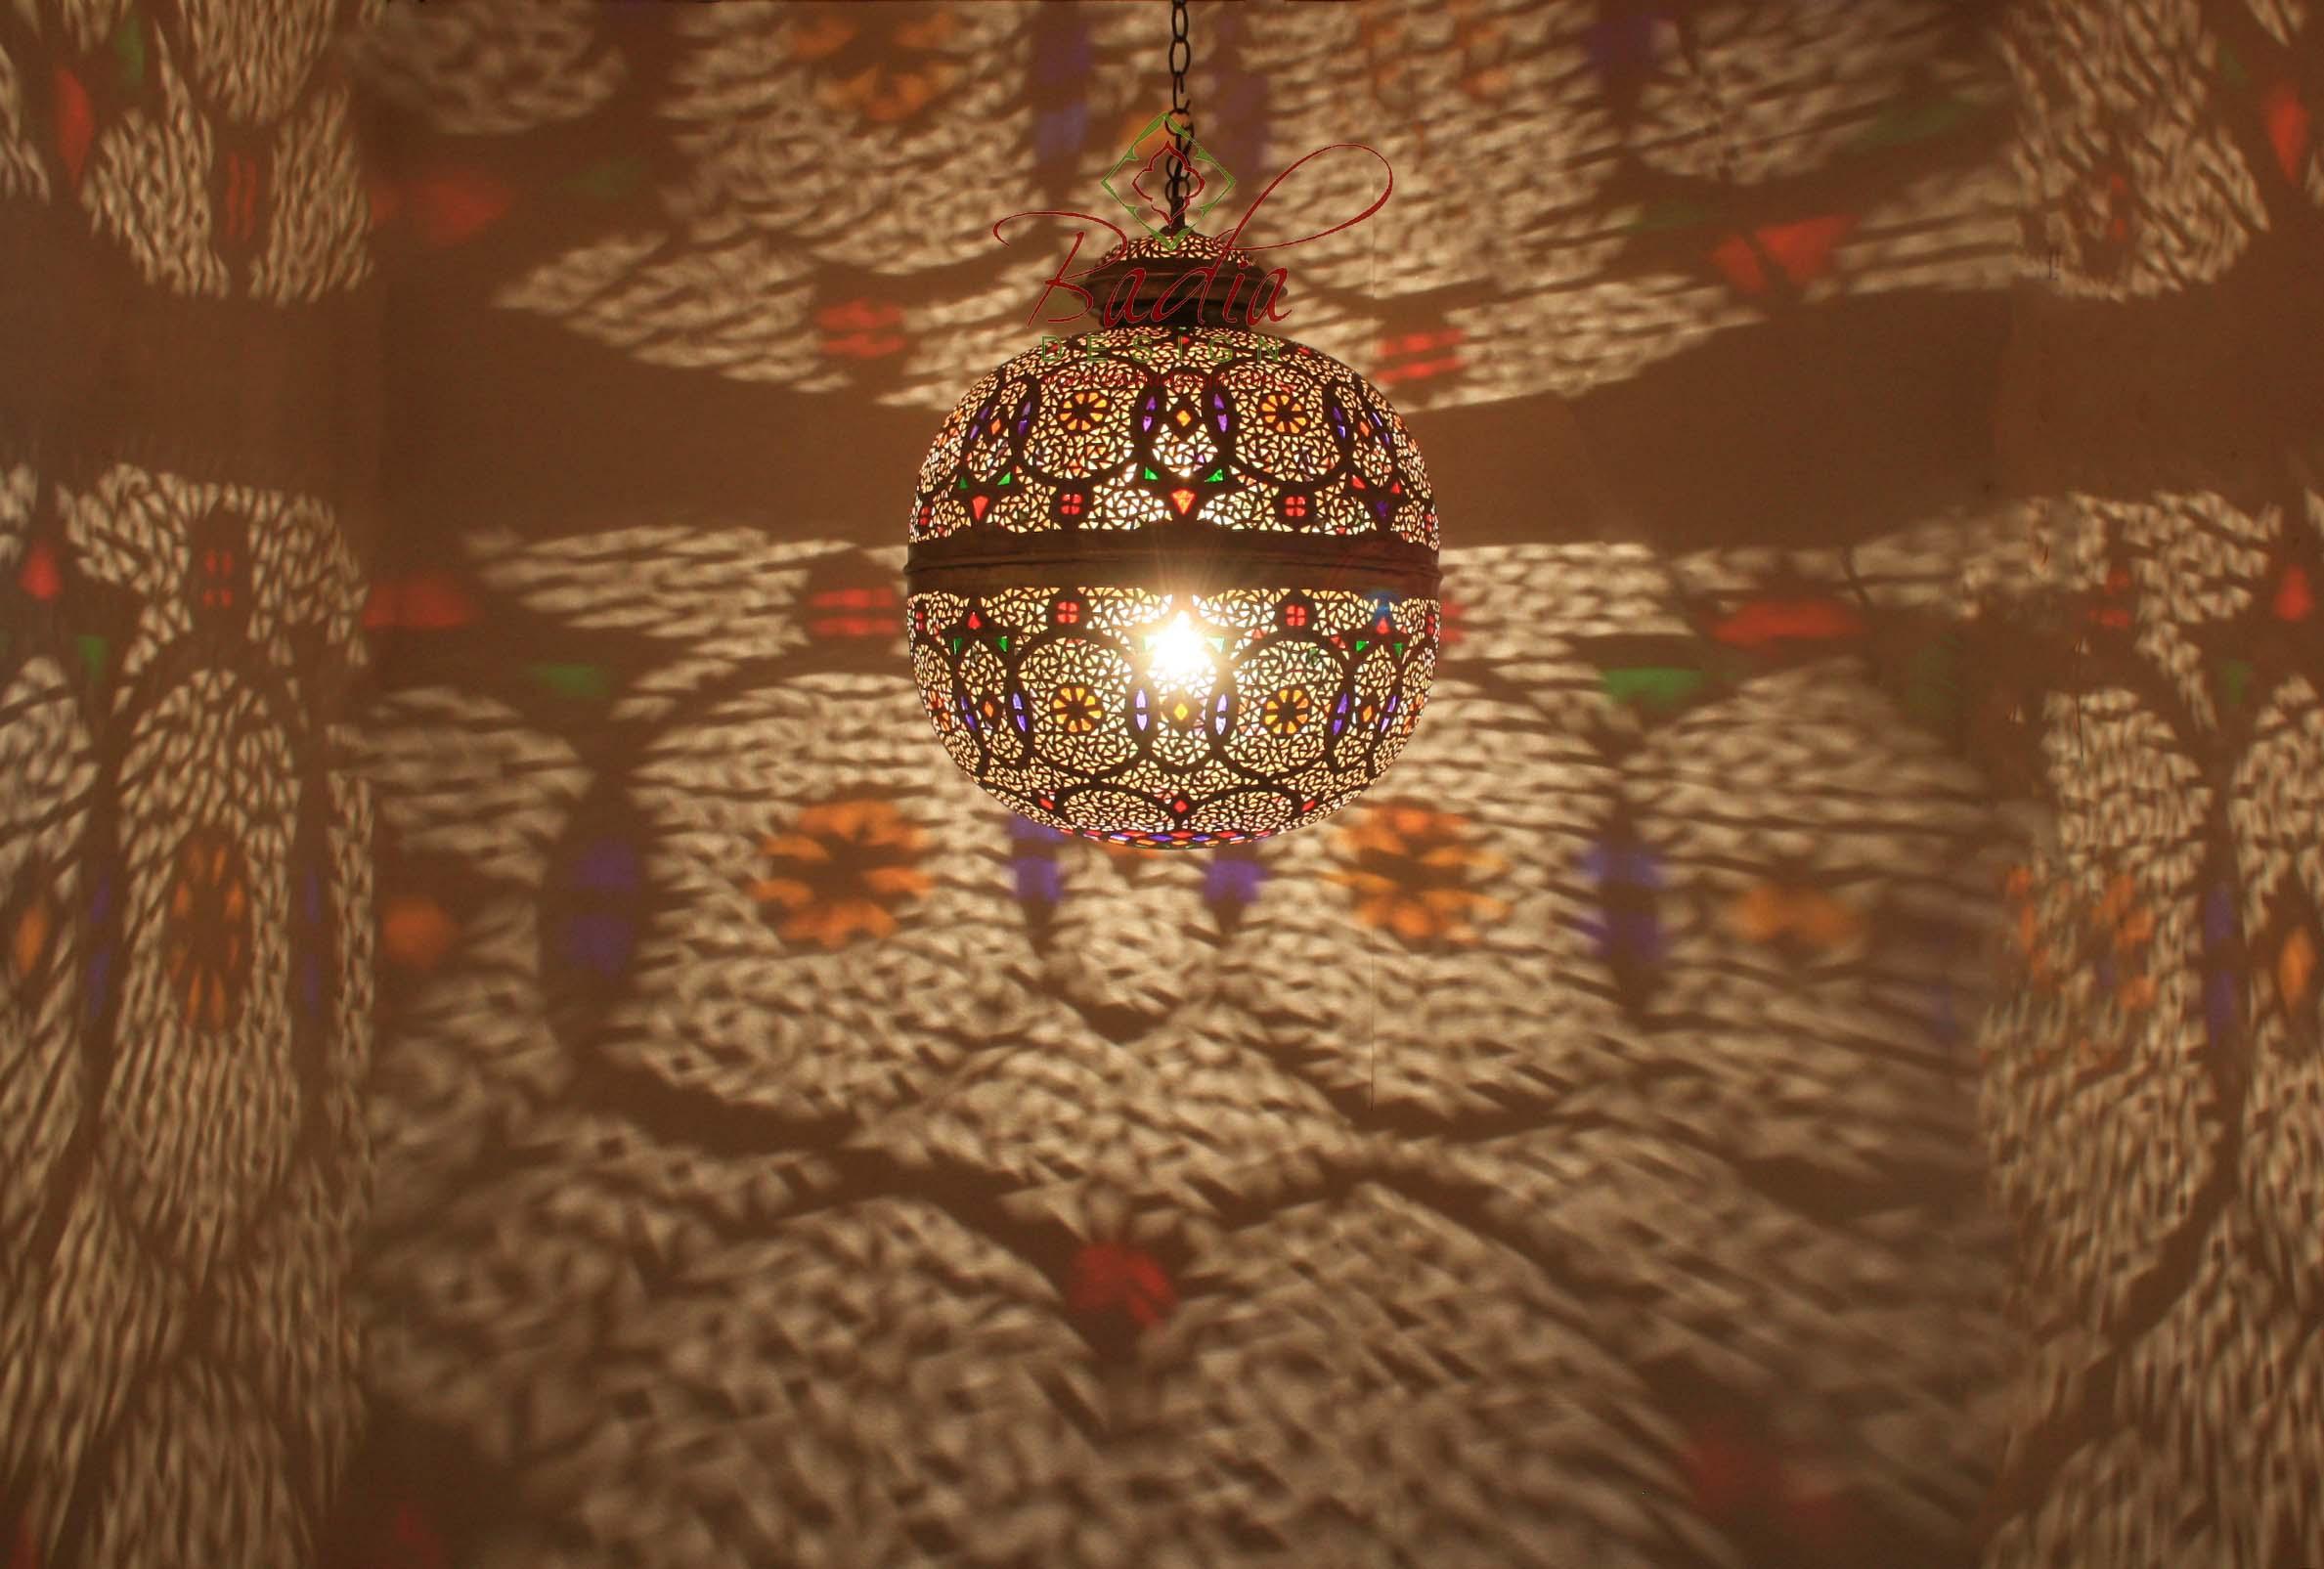 moroccan-multi-color-glass-lantern-lig317-1.jpg